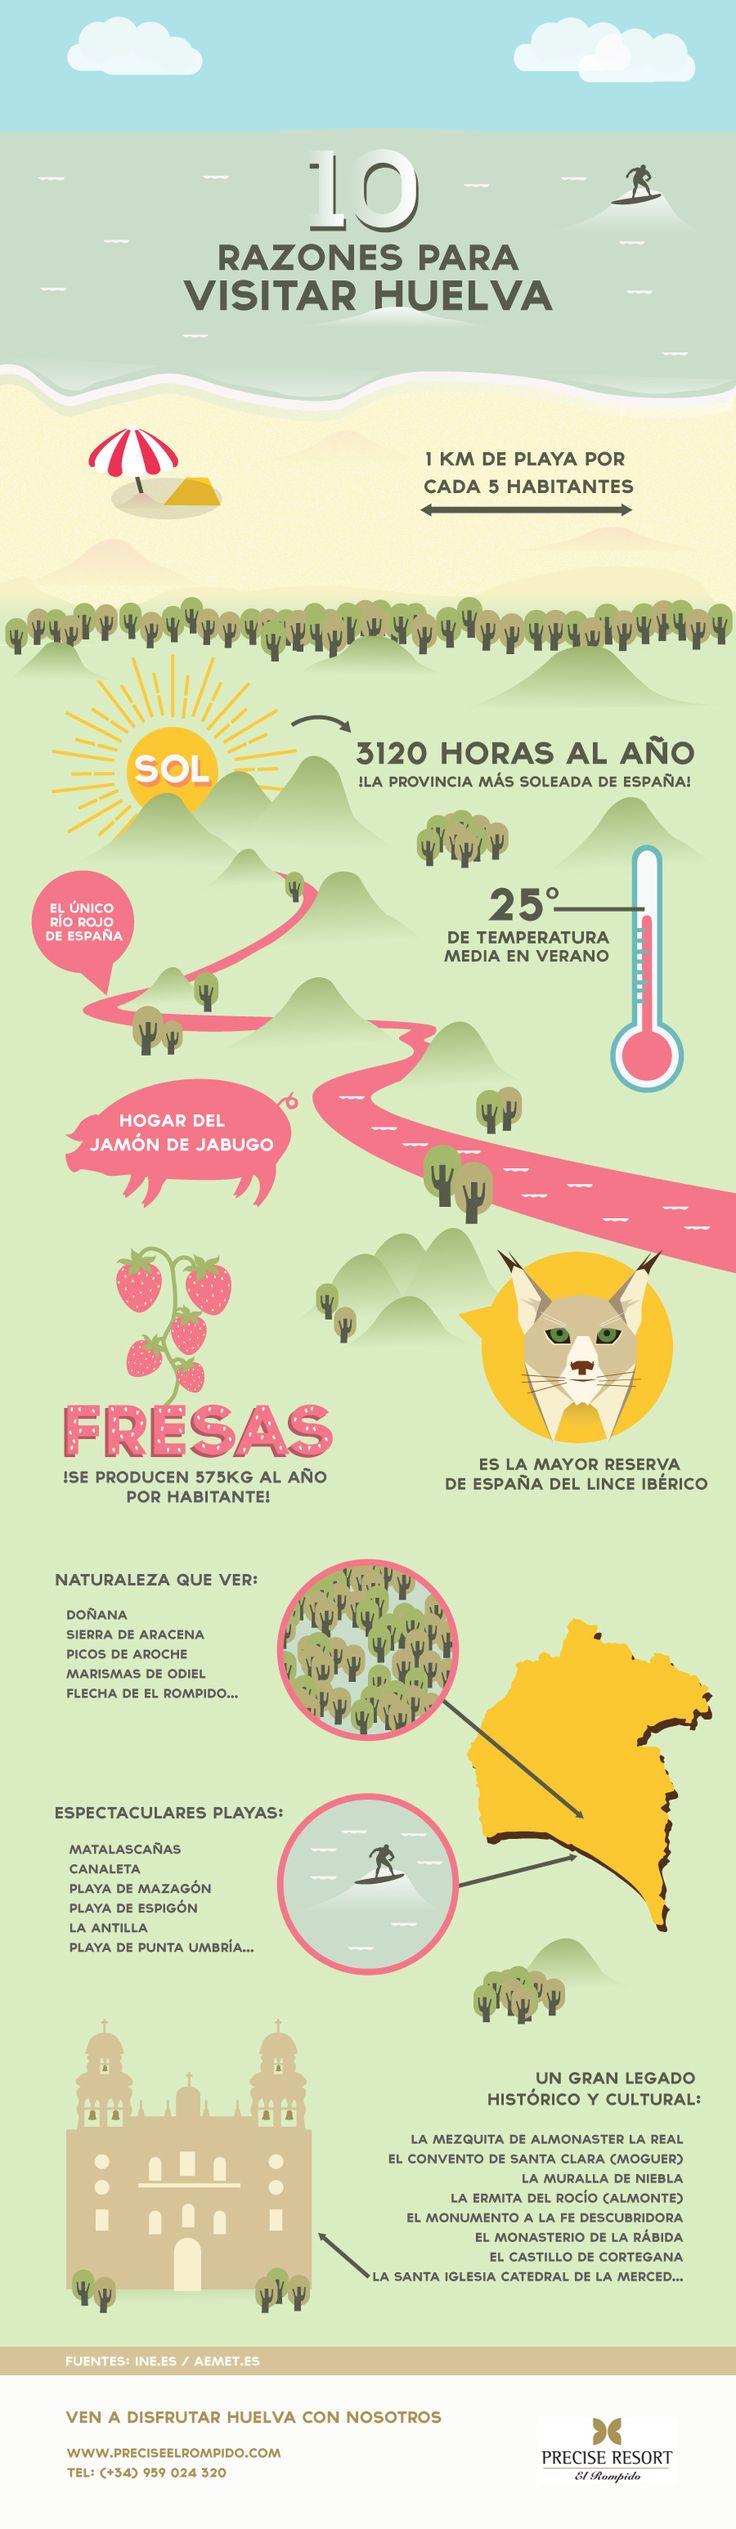 10 razones para visitar Huelva (infografía) / 10 reasons to visit Huelva (infography in Spanish), by @elproximoviaje